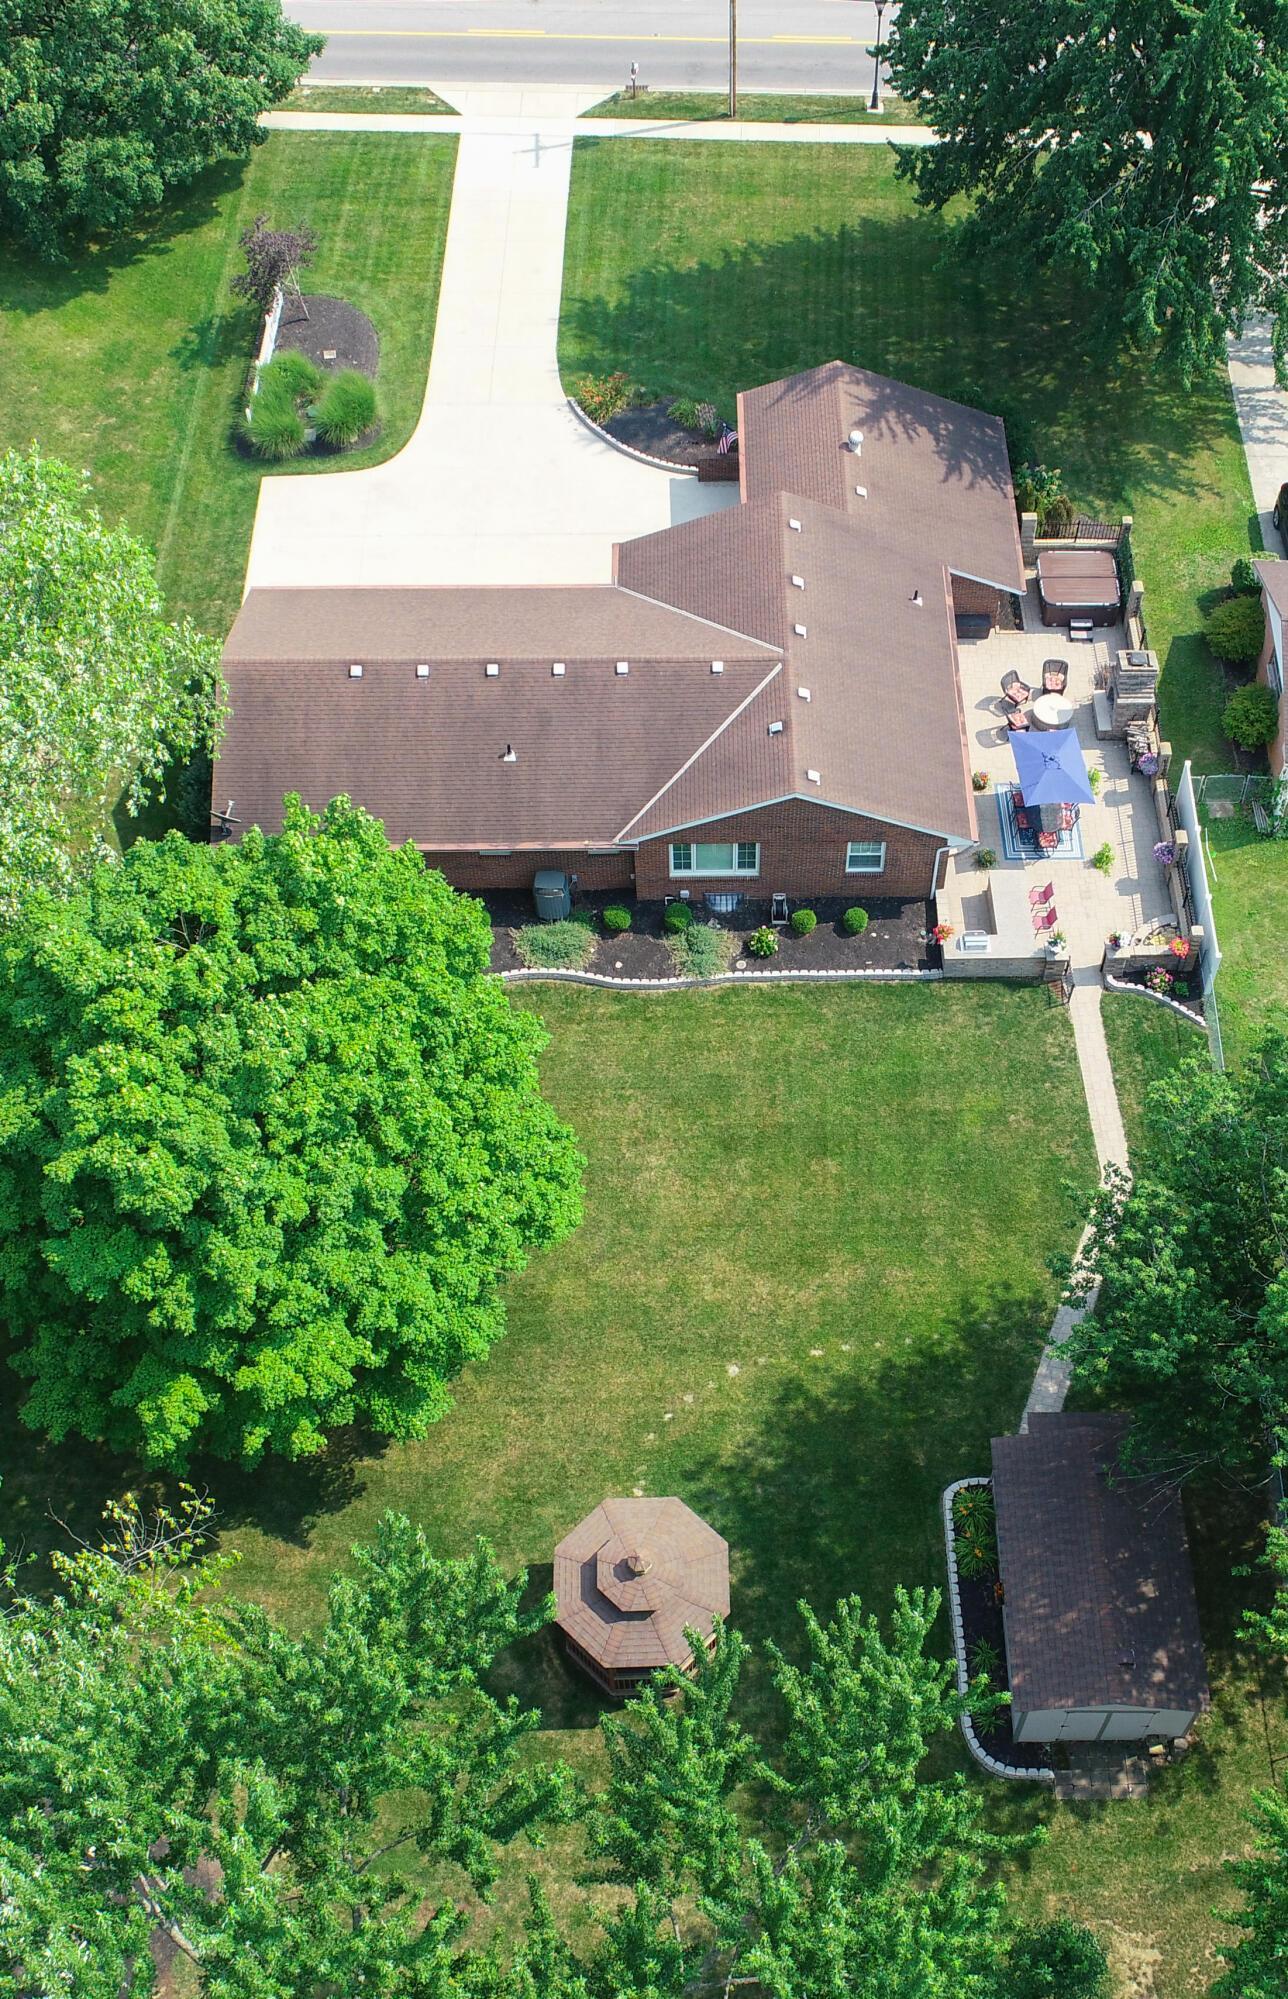 Drone Backyard 2